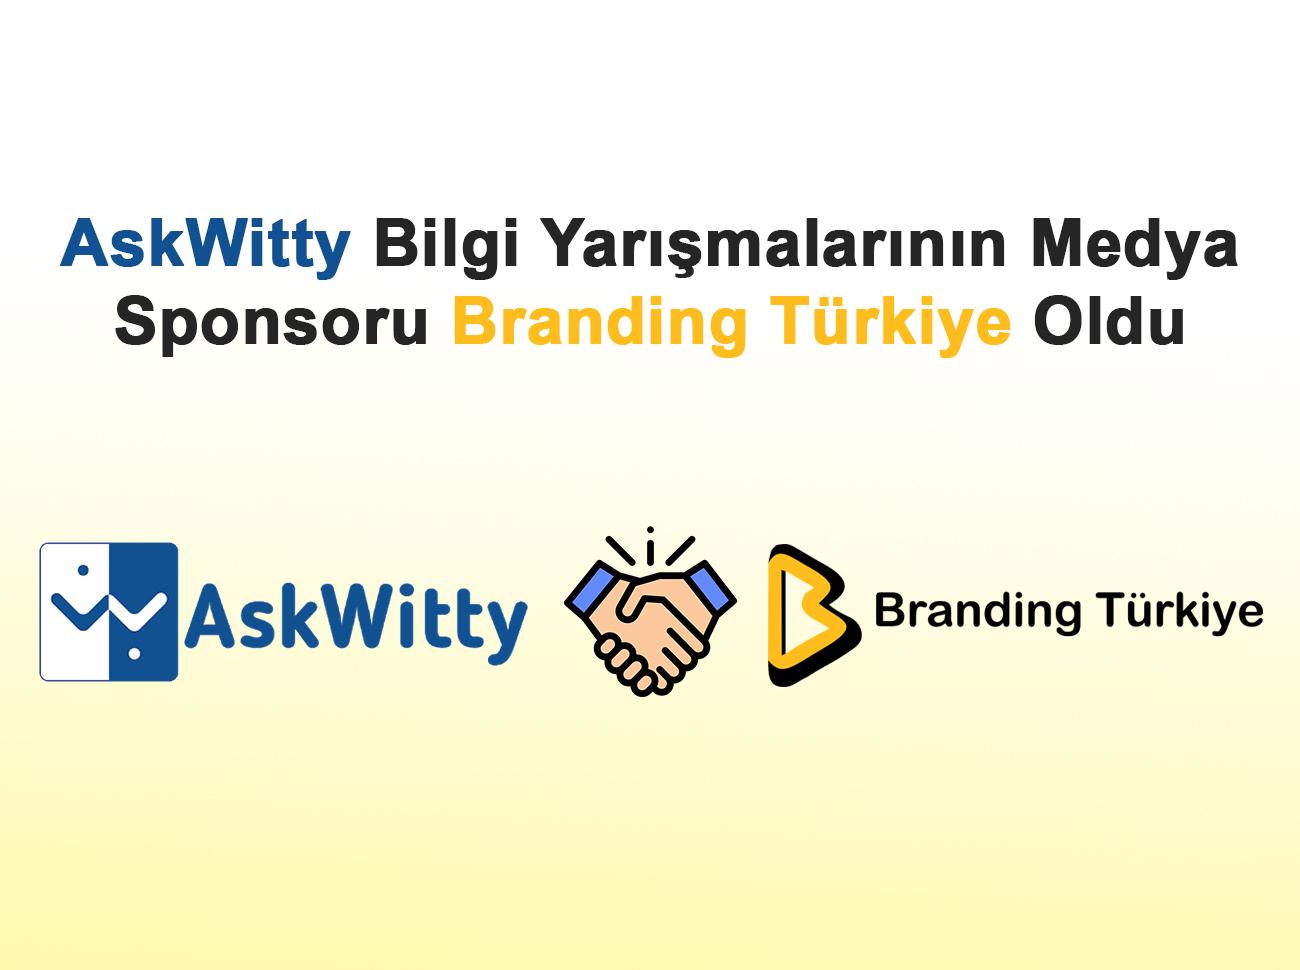 askwitty-bilgi-yarismalarinin-medya-sponsoru-branding-turkiye-oldu